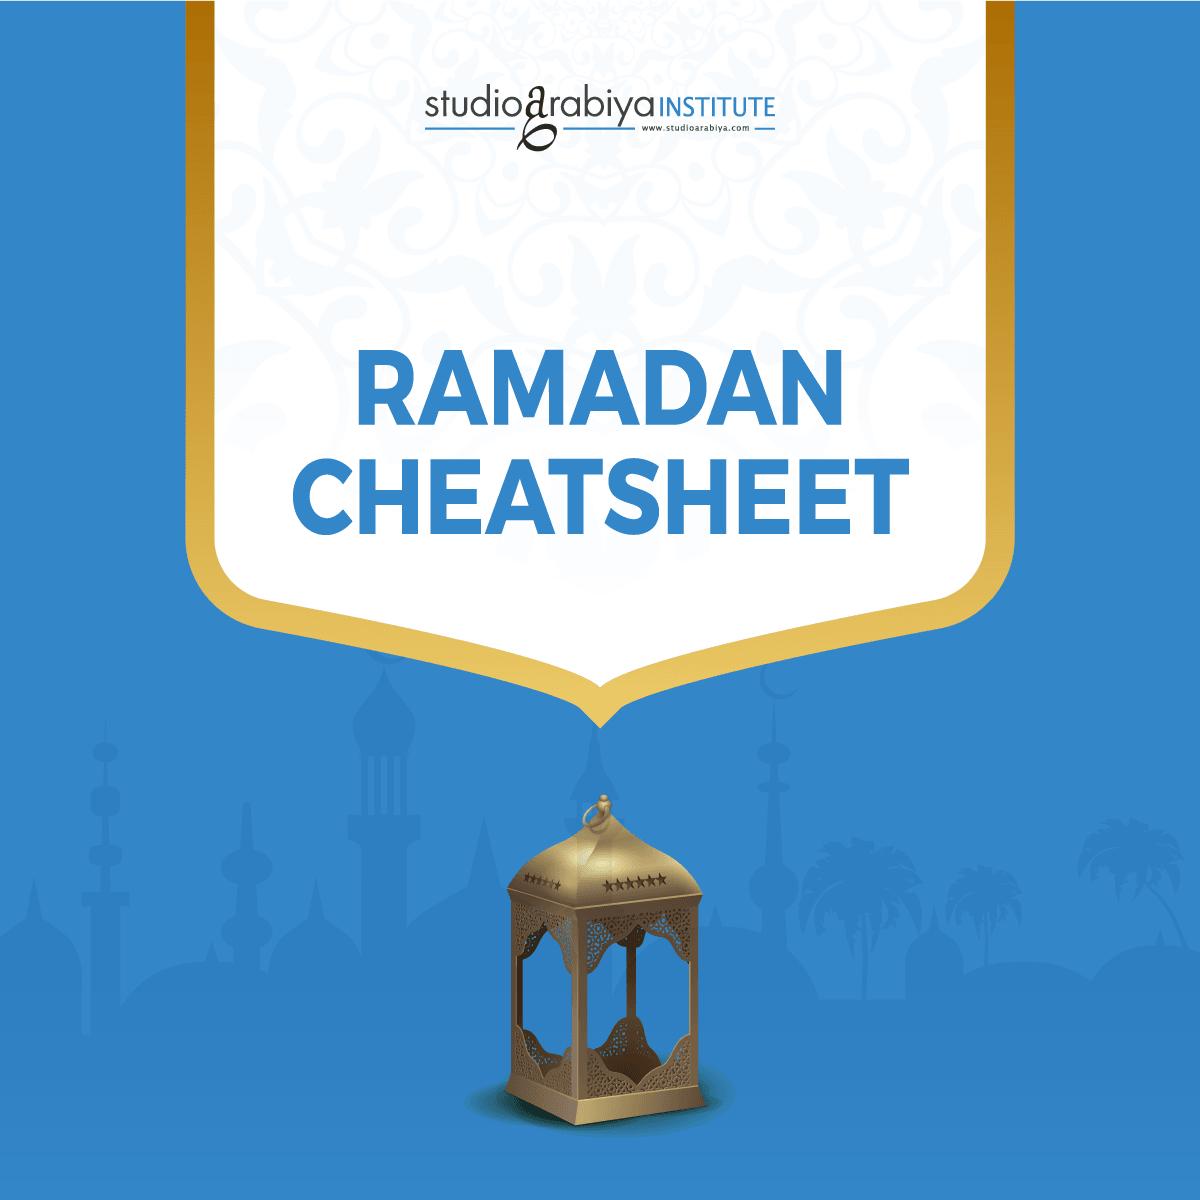 b2ap3_large_ramadan-cheatsheet-post [FREE DOWNLOAD] Ramadan Cheatsheet - Blog